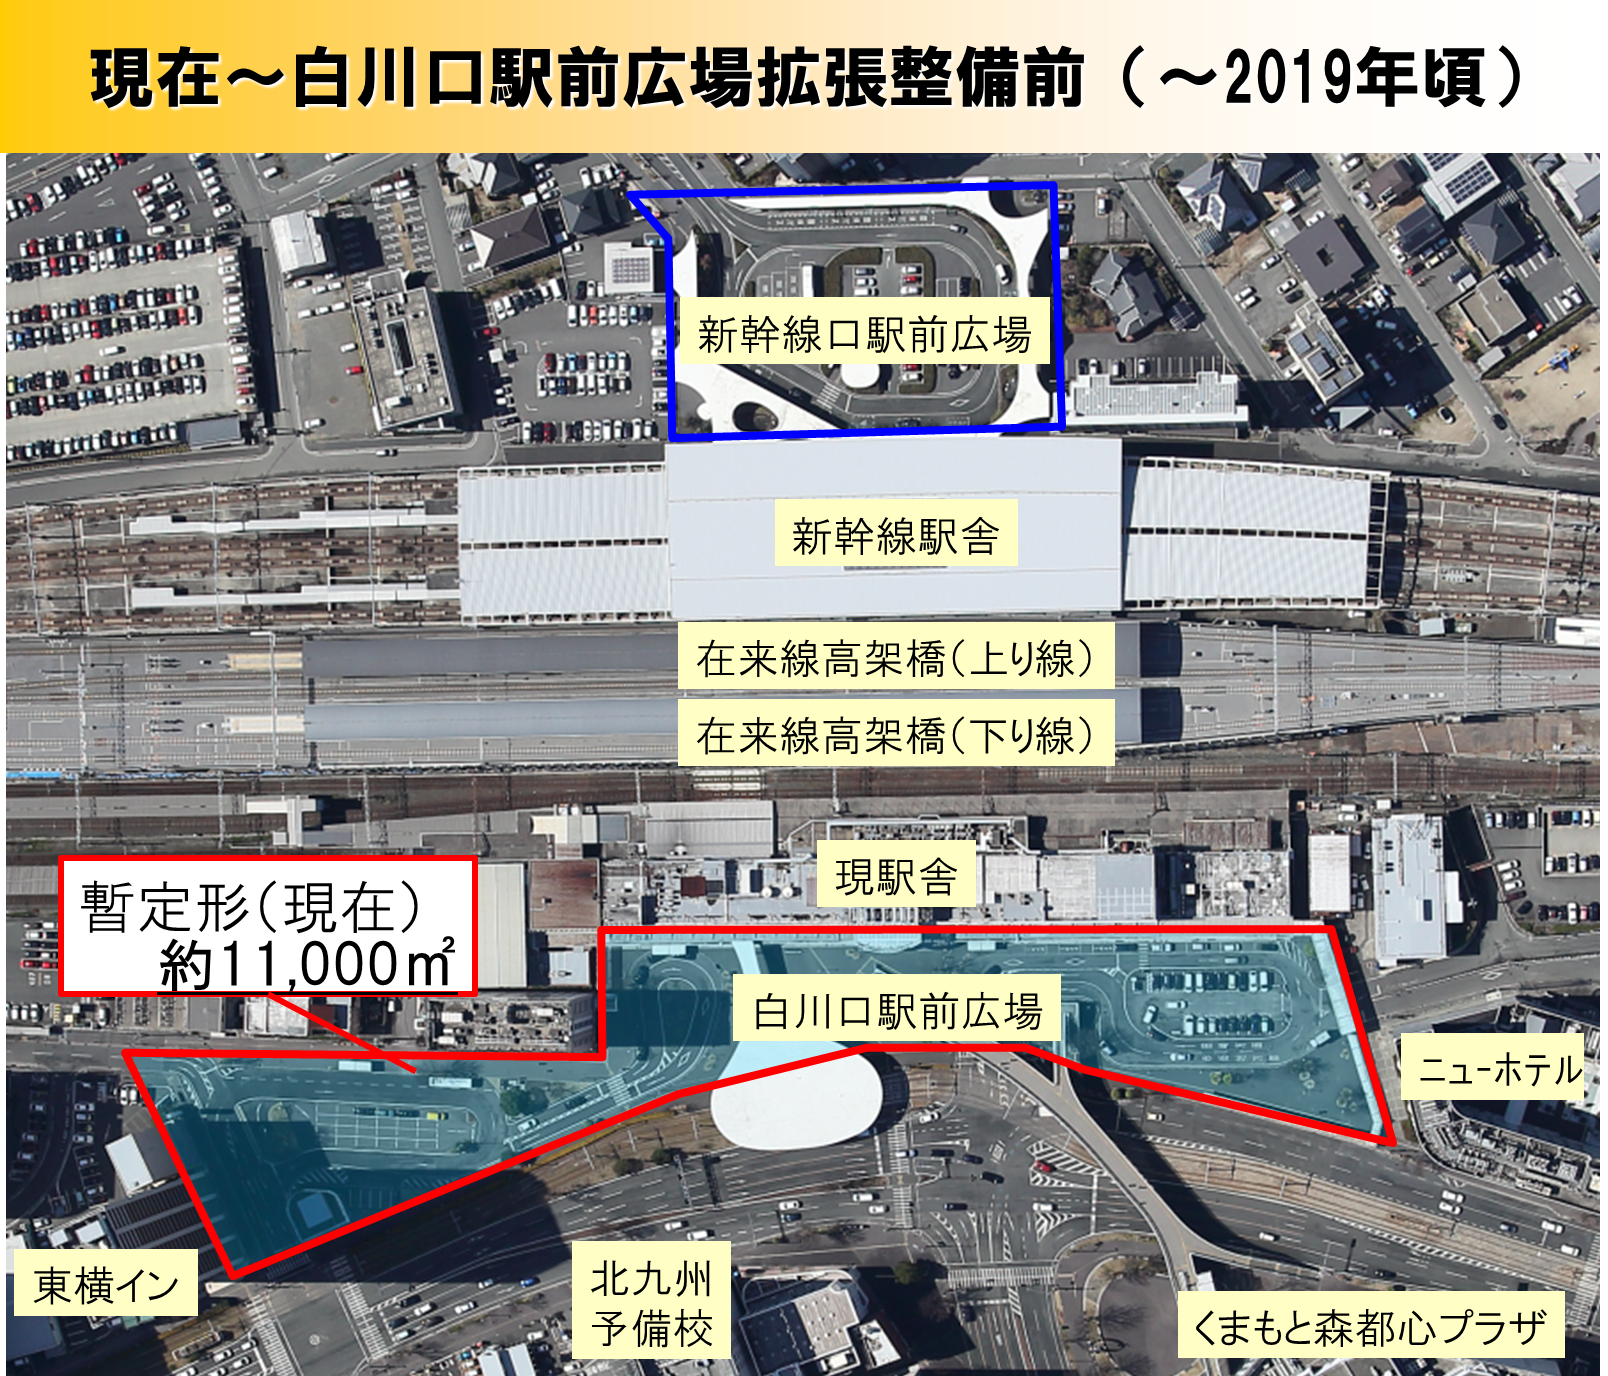 白川口駅前の広場拡張整備前(2019年頃)の様子